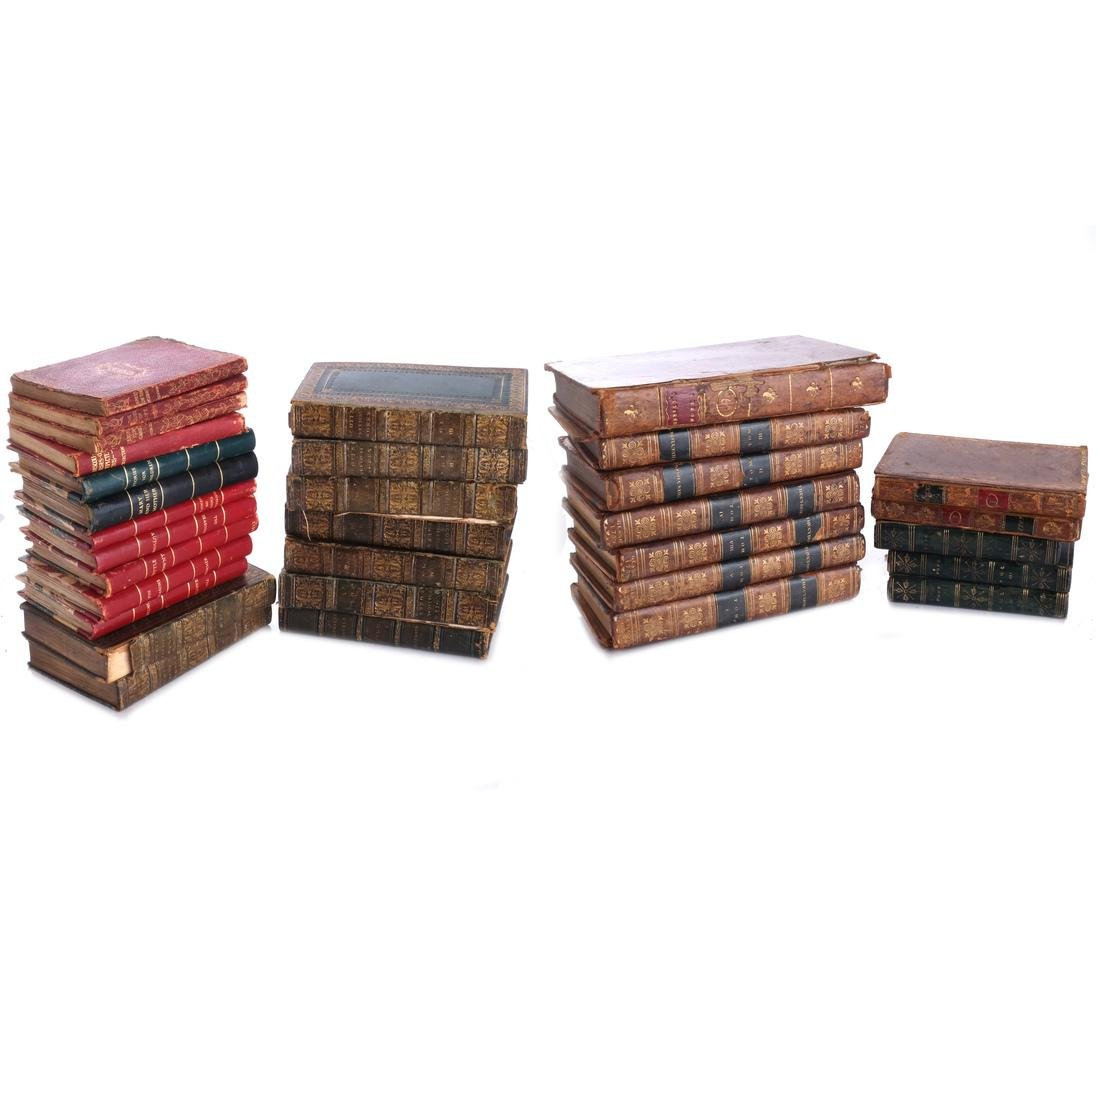 Books: 27+ Volumes